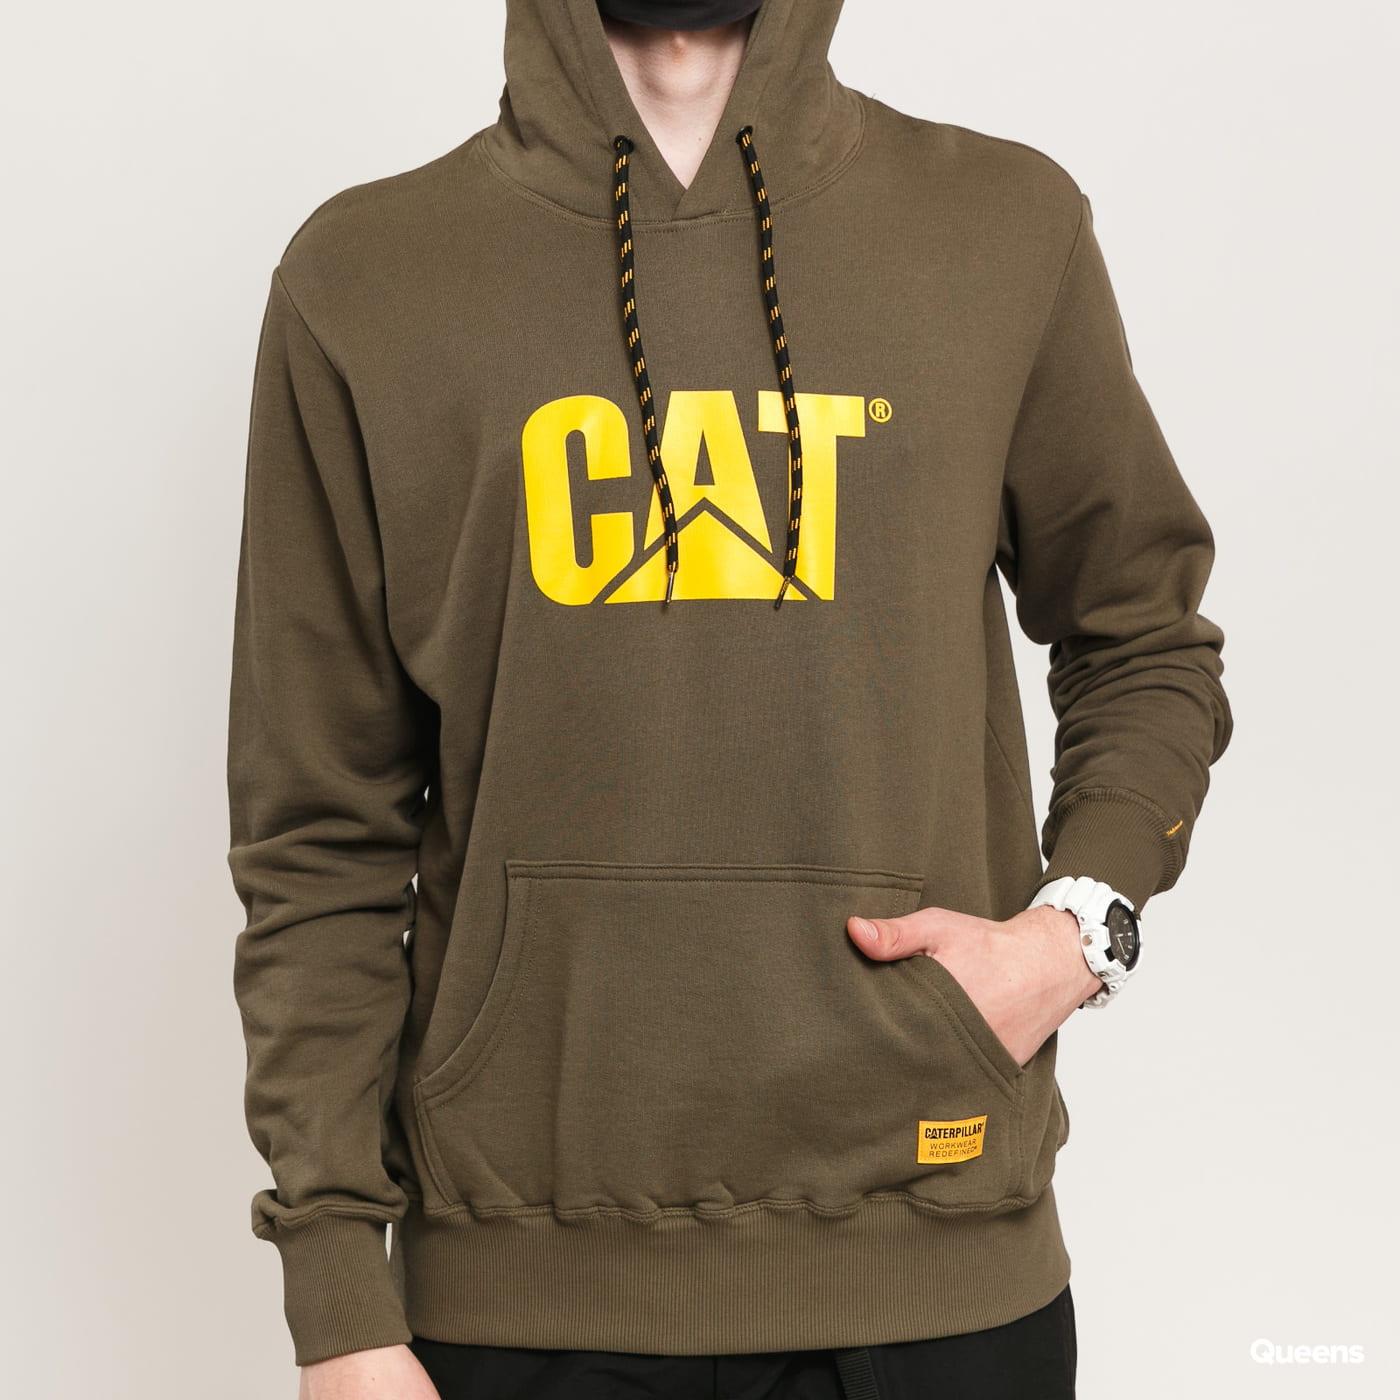 CATERPILLAR Classic CAT Pull Over olivová